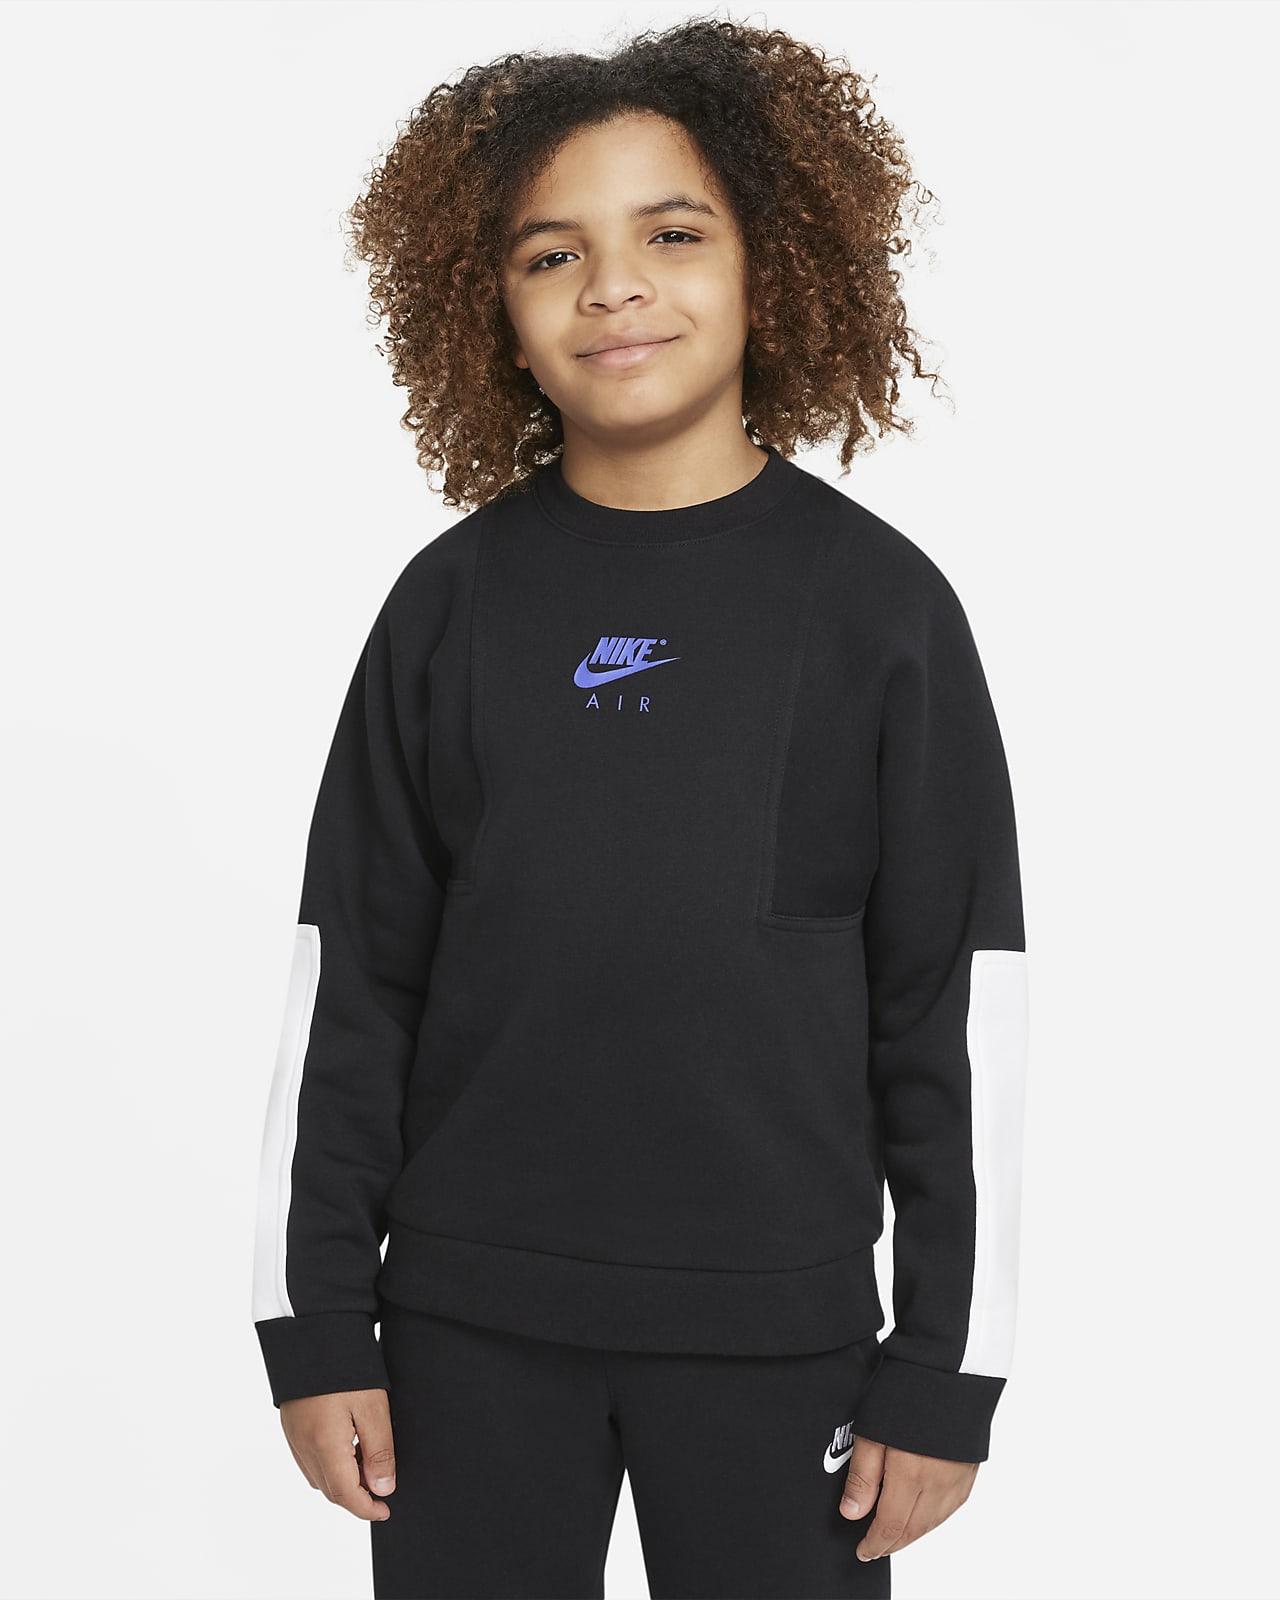 Nike Air Dessuadora - Nen